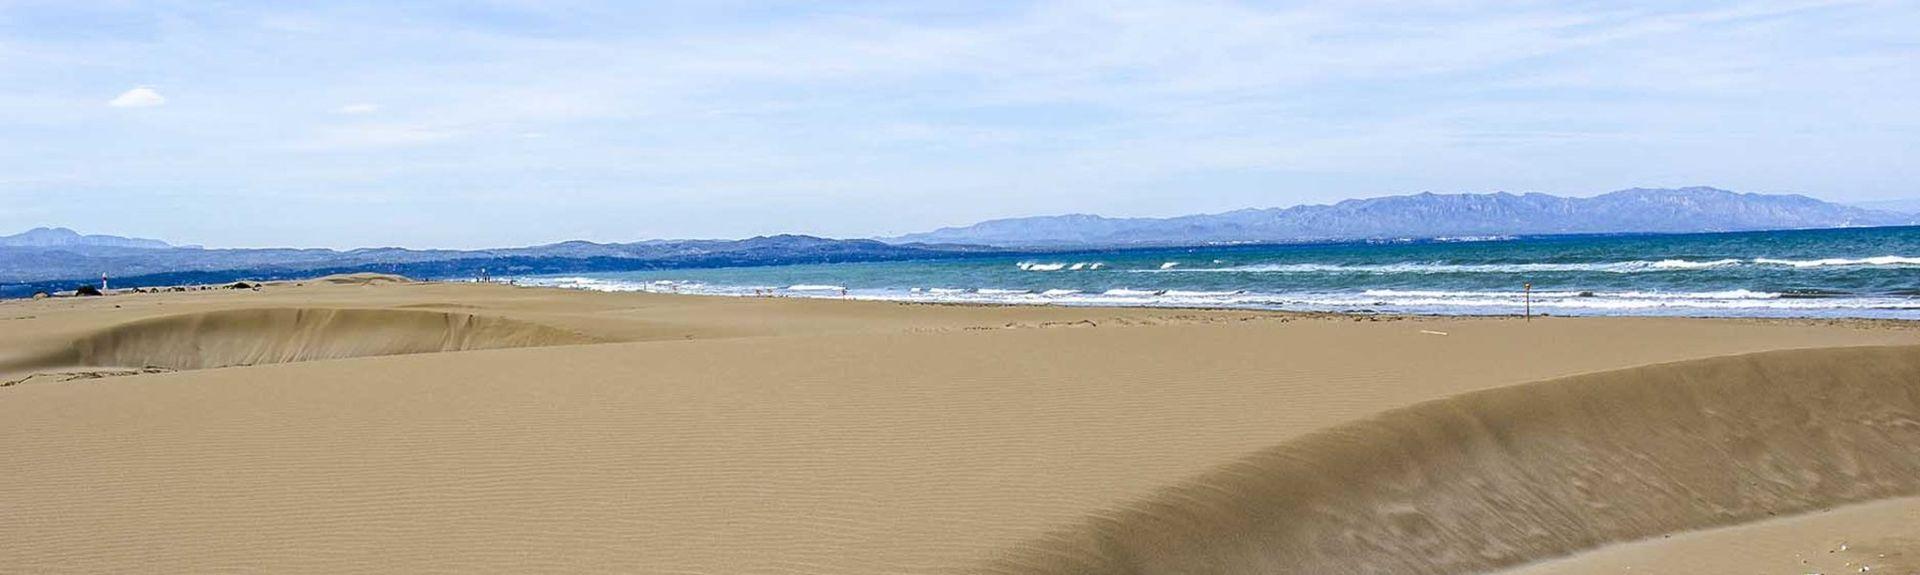 Przylądek del Fangar, Deltebre, Katalonia, Hiszpania